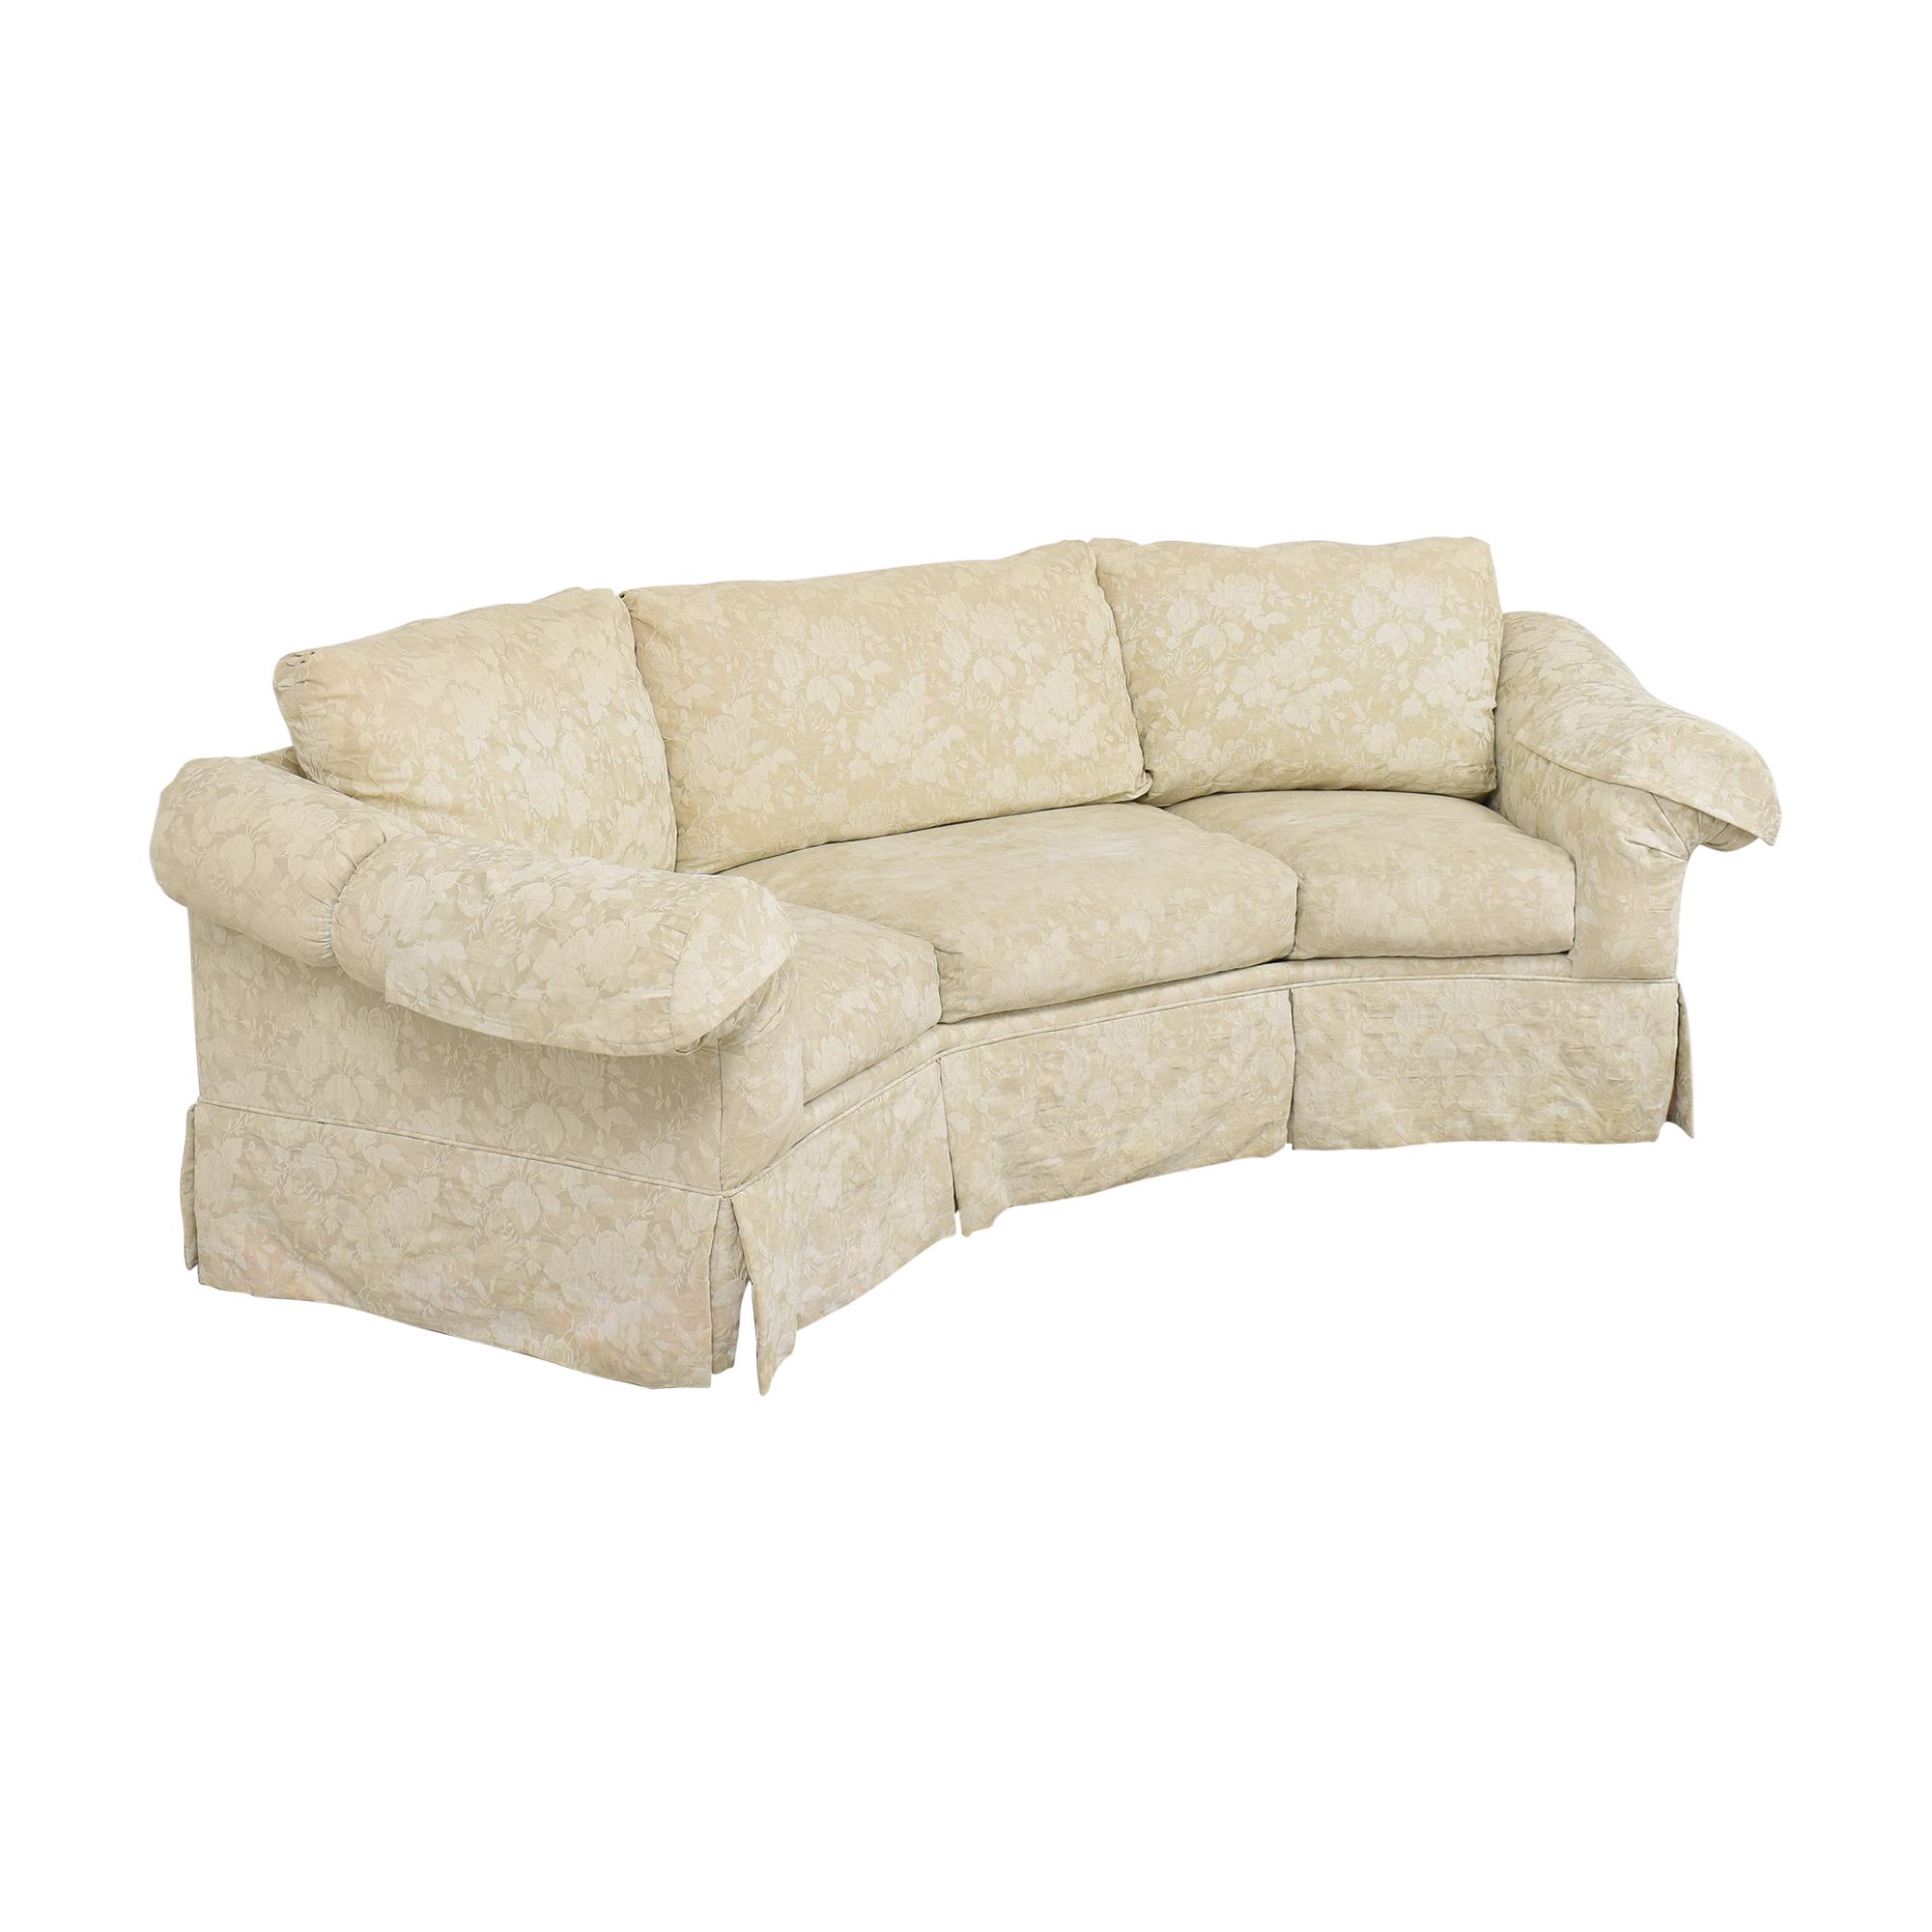 Rowe Furniture Rowe Furniture Skirted Crescent Sofa price